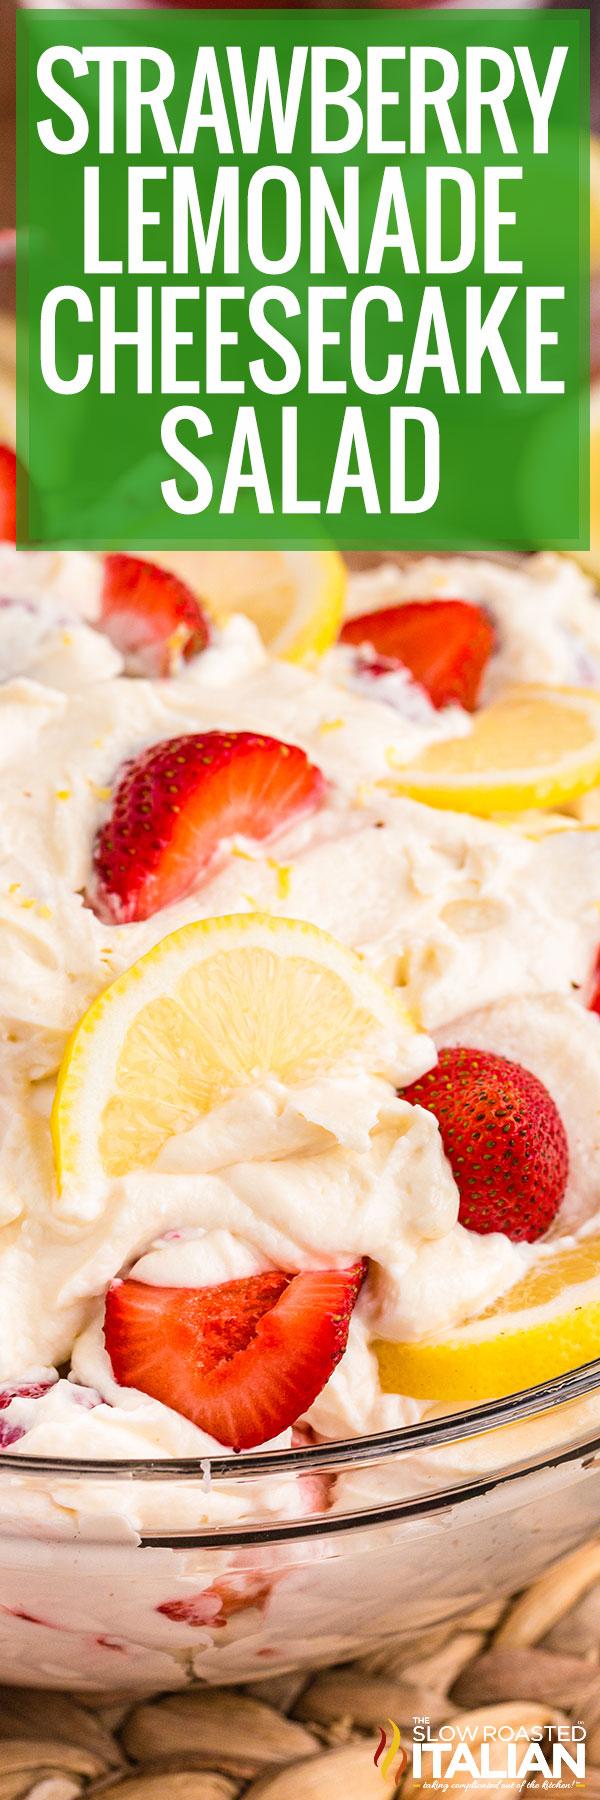 Strawberry Lemonade Cheesecake Salad closeup